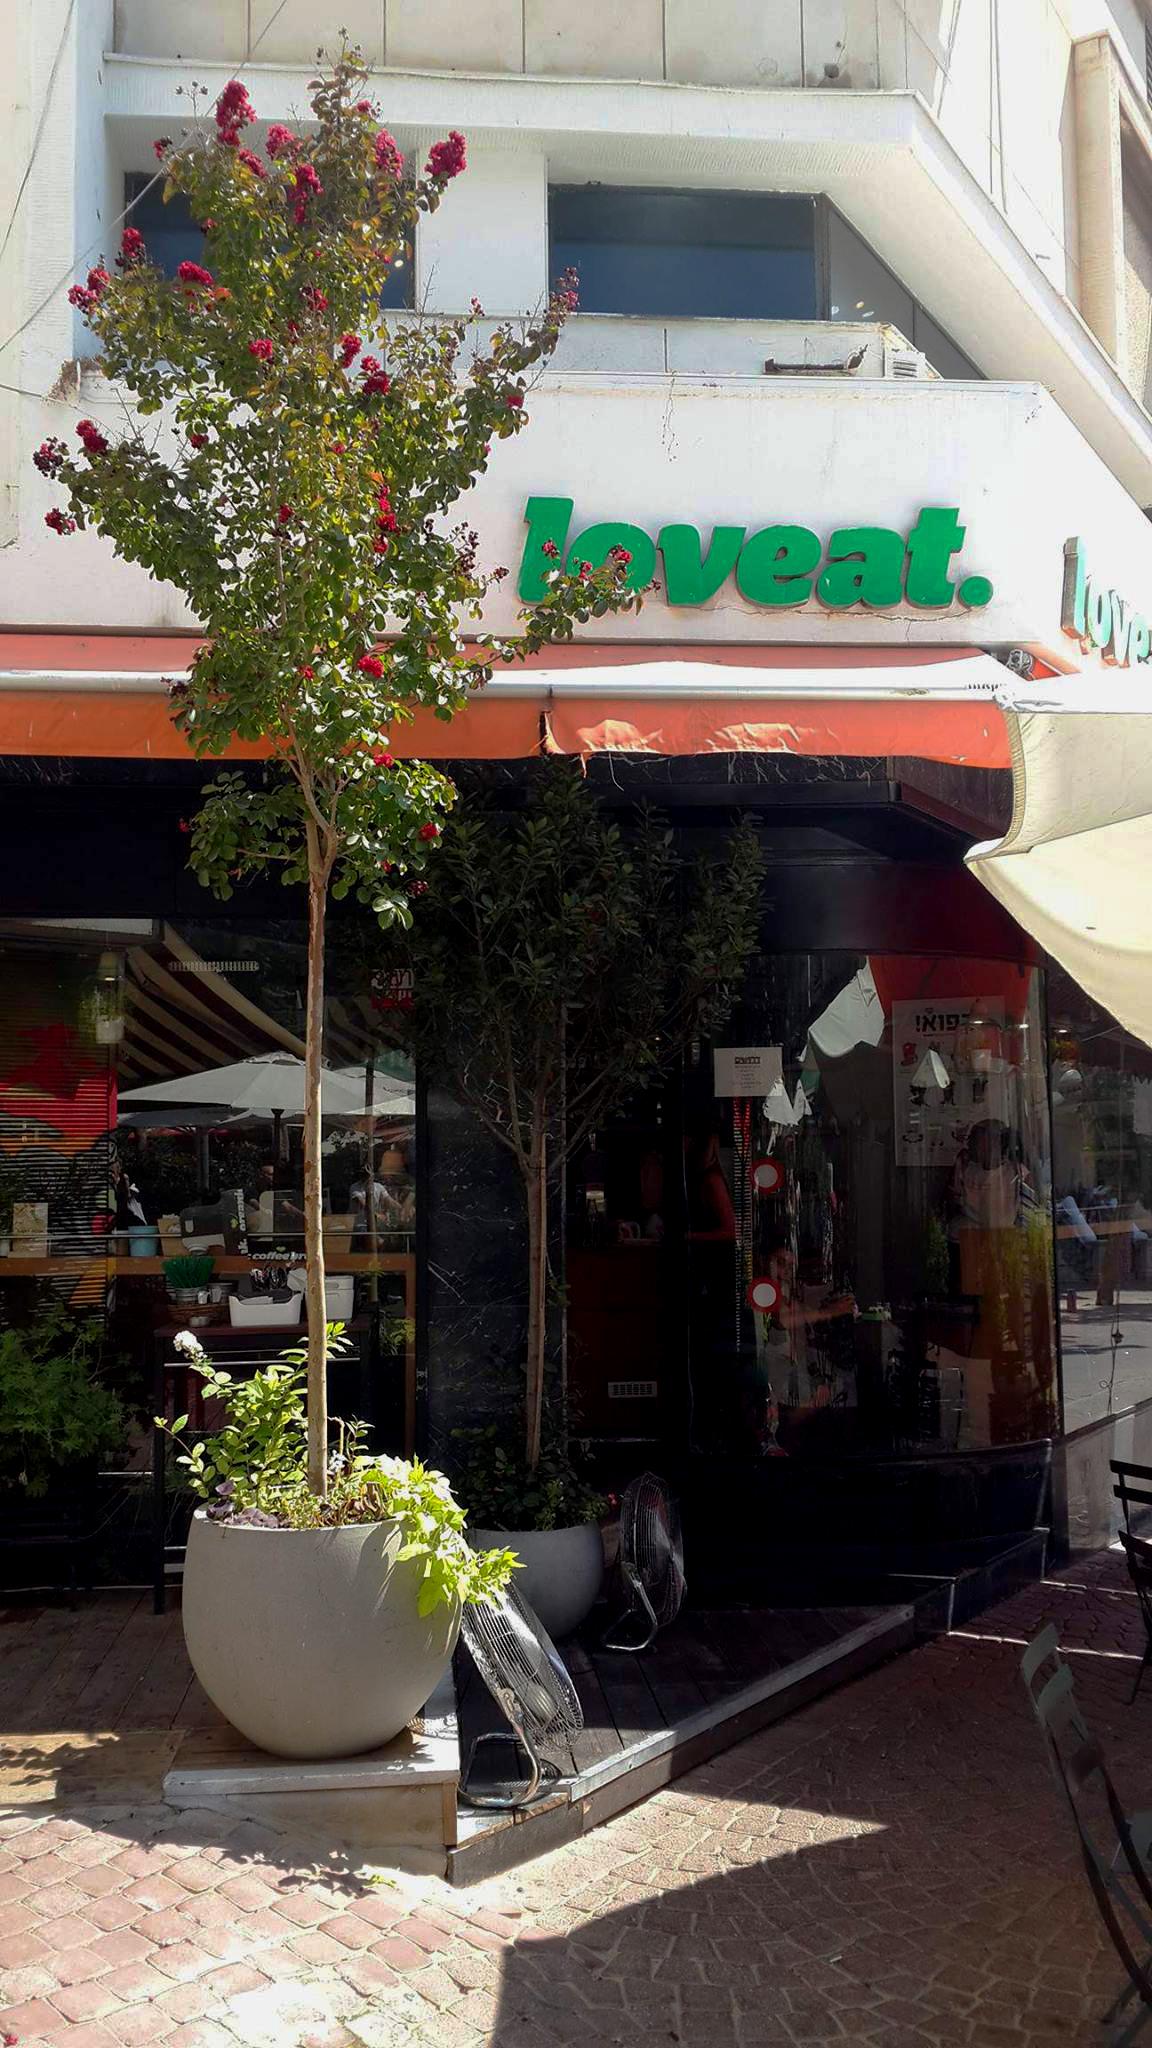 Loveat #Savant - Source: Loveat.